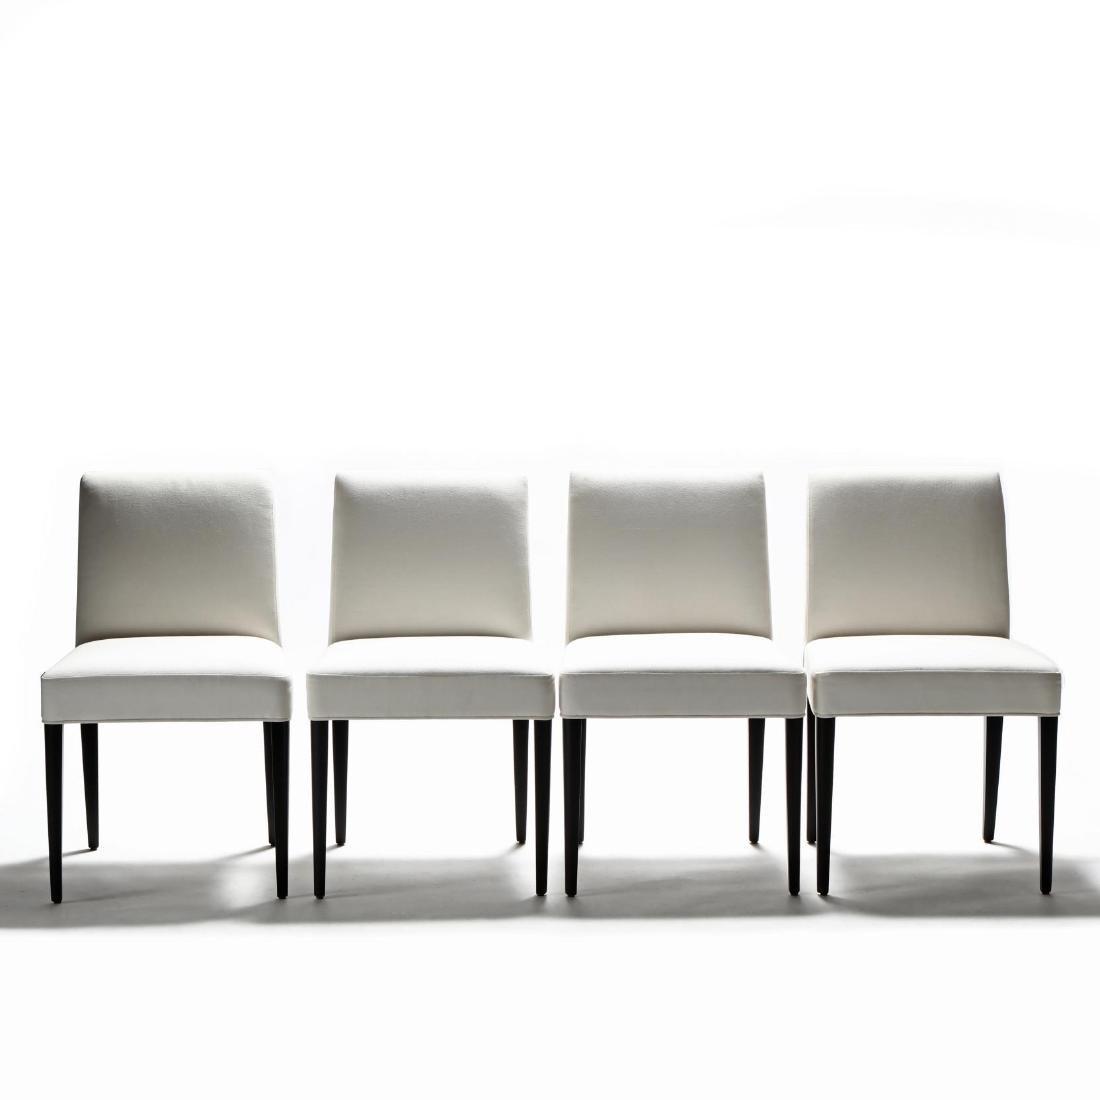 Kara Mann, Set of Four Contemporary Upholstered Dining